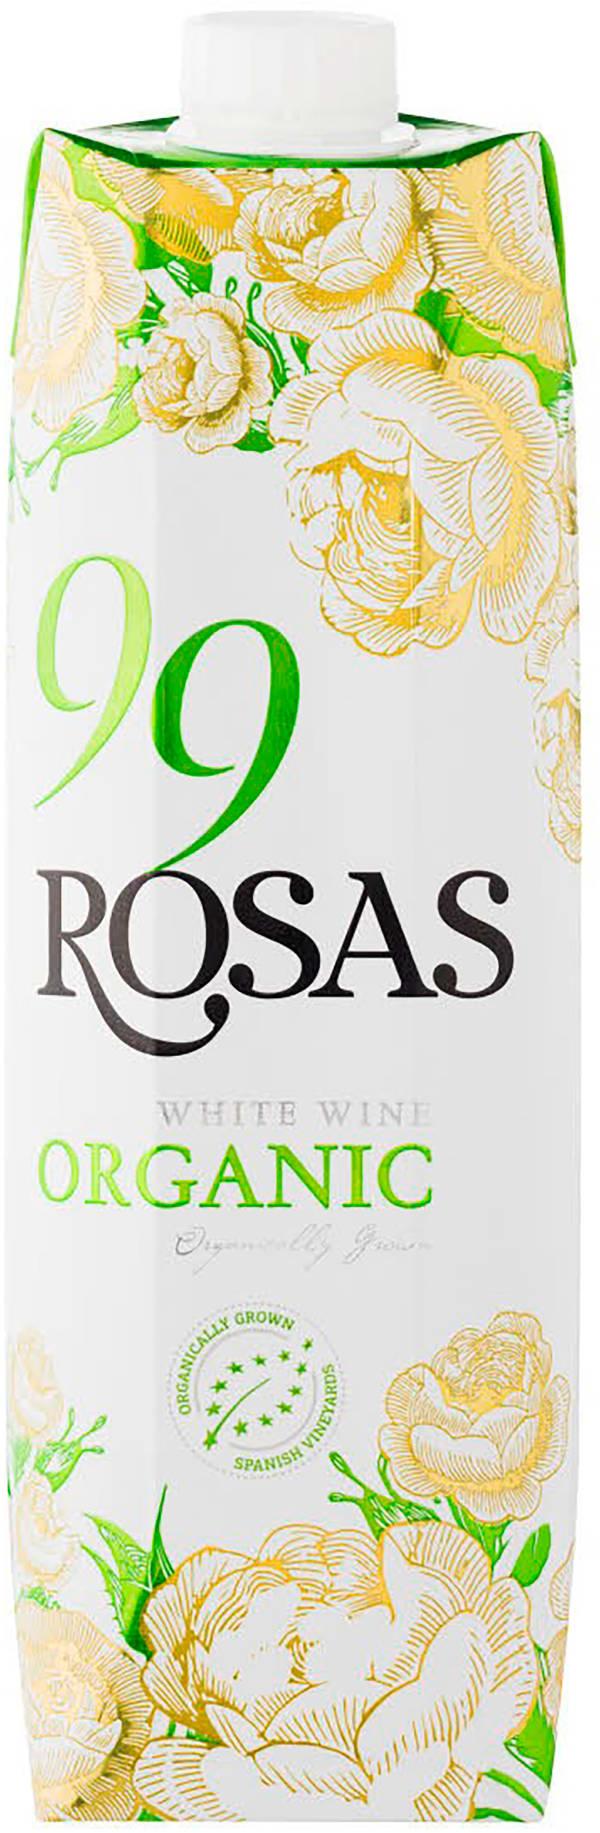 99 Rosas Organic White Wine 2019 carton package